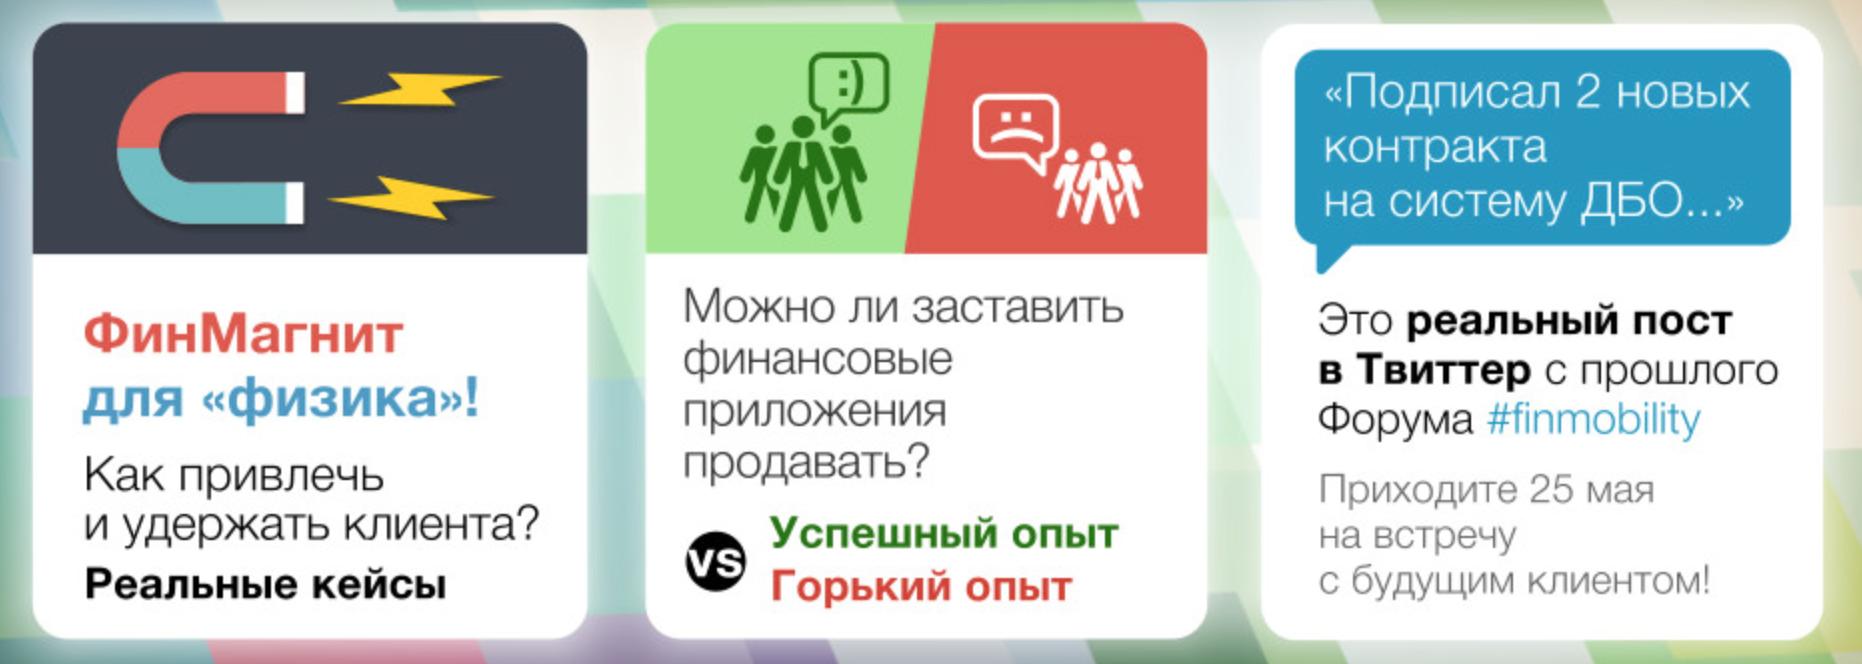 Снимок экрана 2015-05-07 в 19.35.13